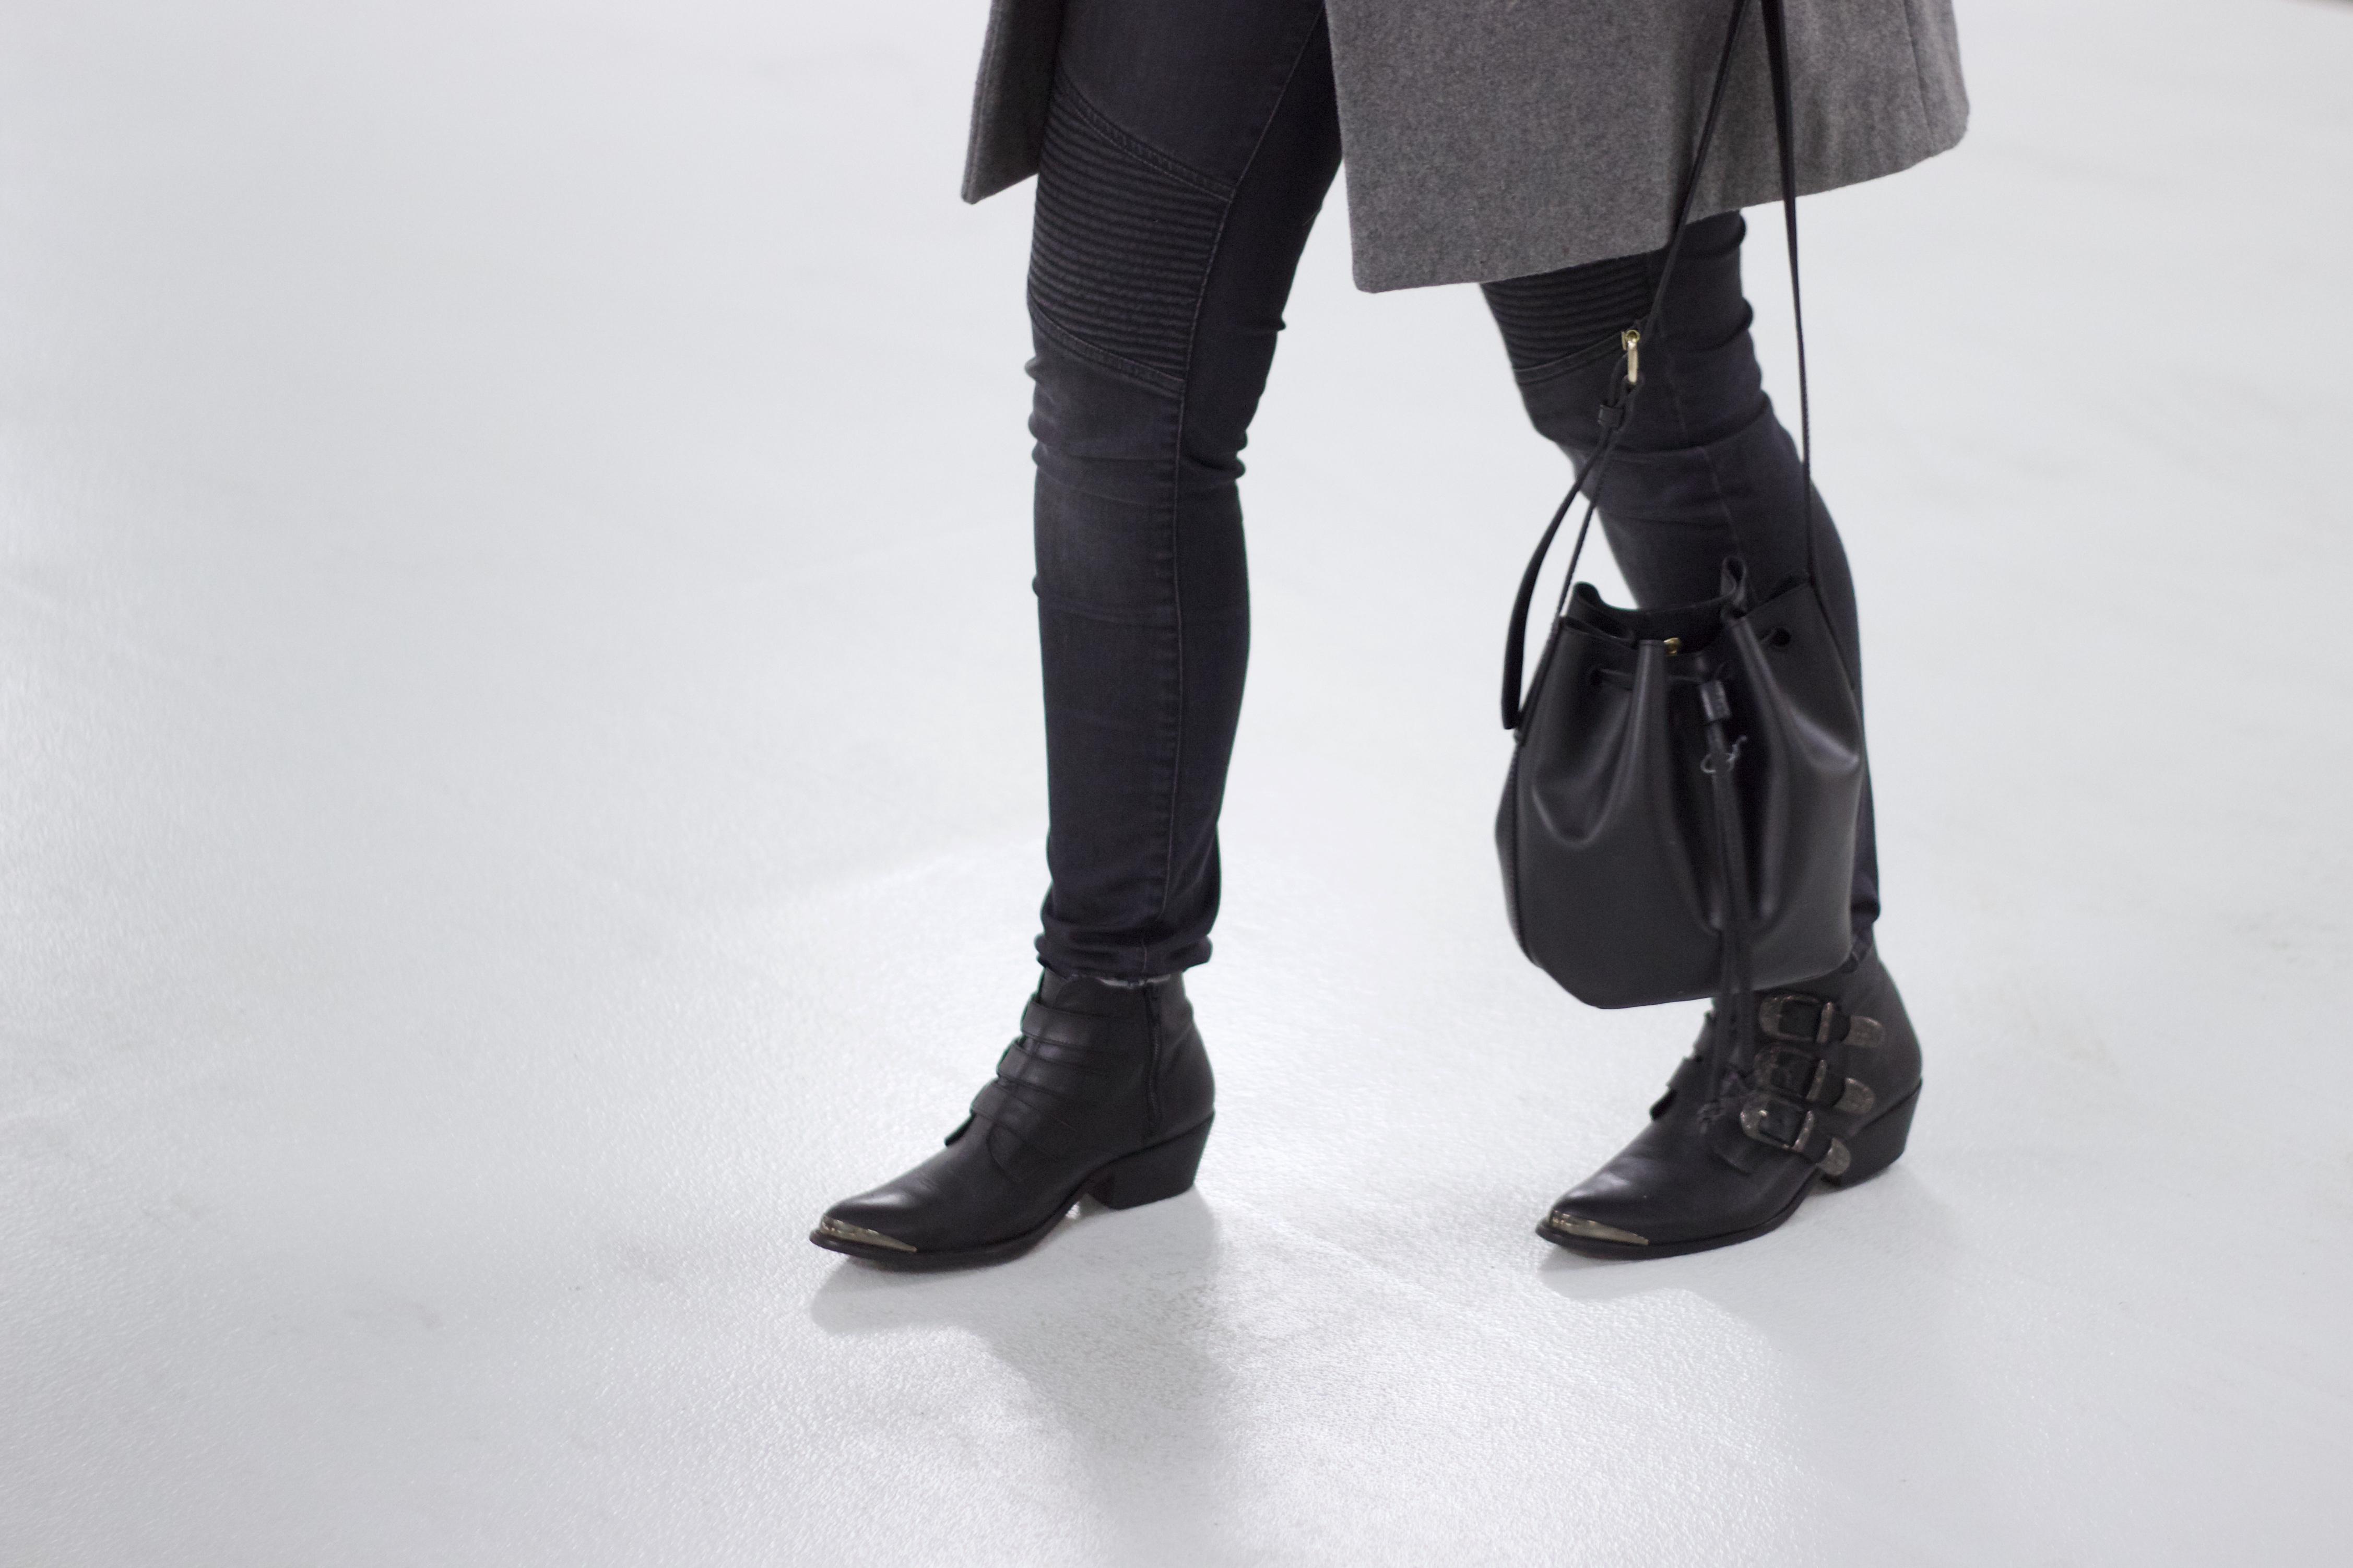 Black-grey-streetstyle-combination-simple-basic